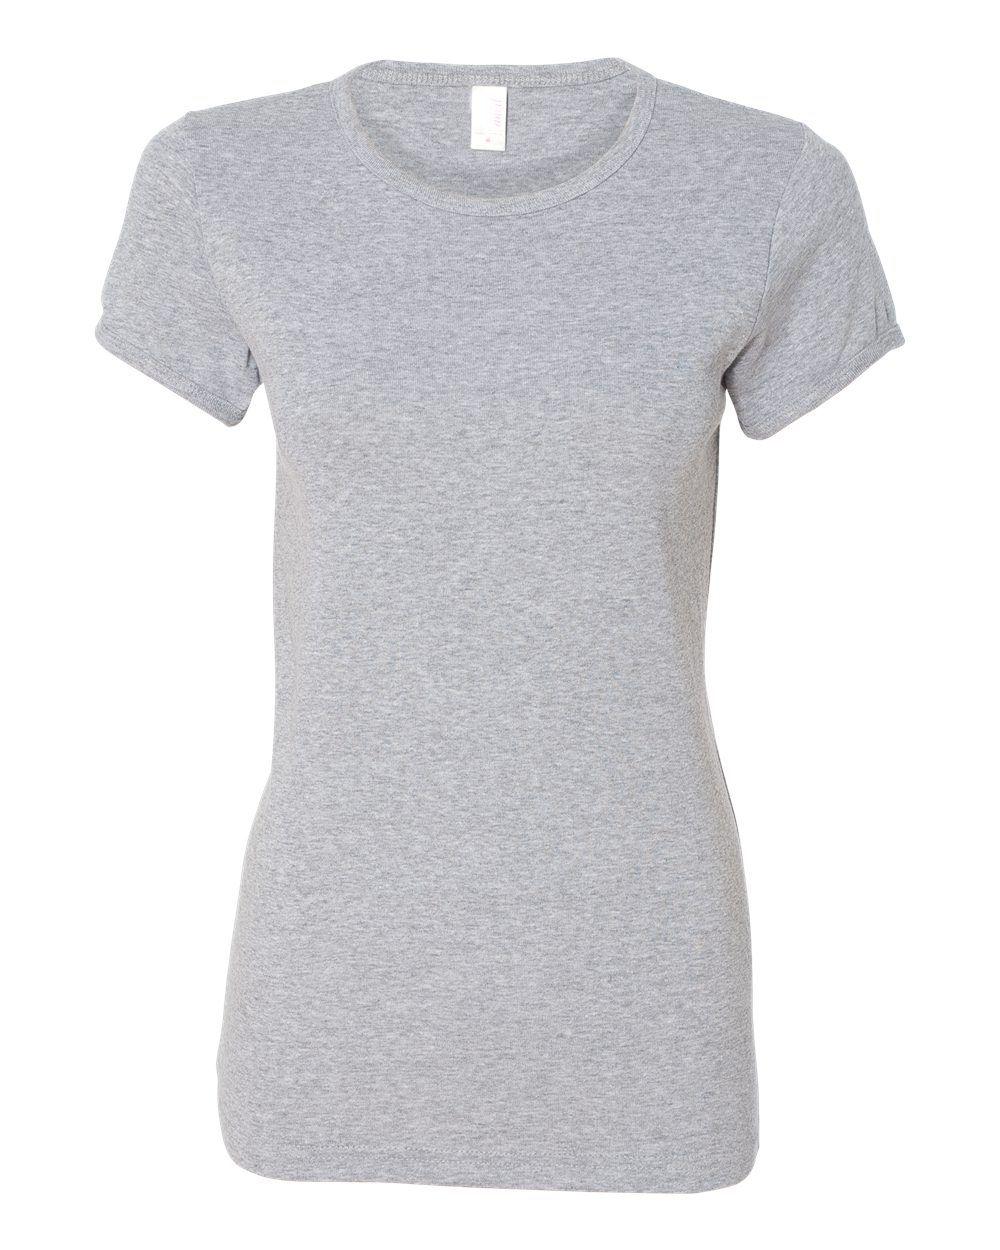 anvil heather grey ladies 11 rib cap sleeve scoopneck t shirt 1441 free shipping activewear. Black Bedroom Furniture Sets. Home Design Ideas